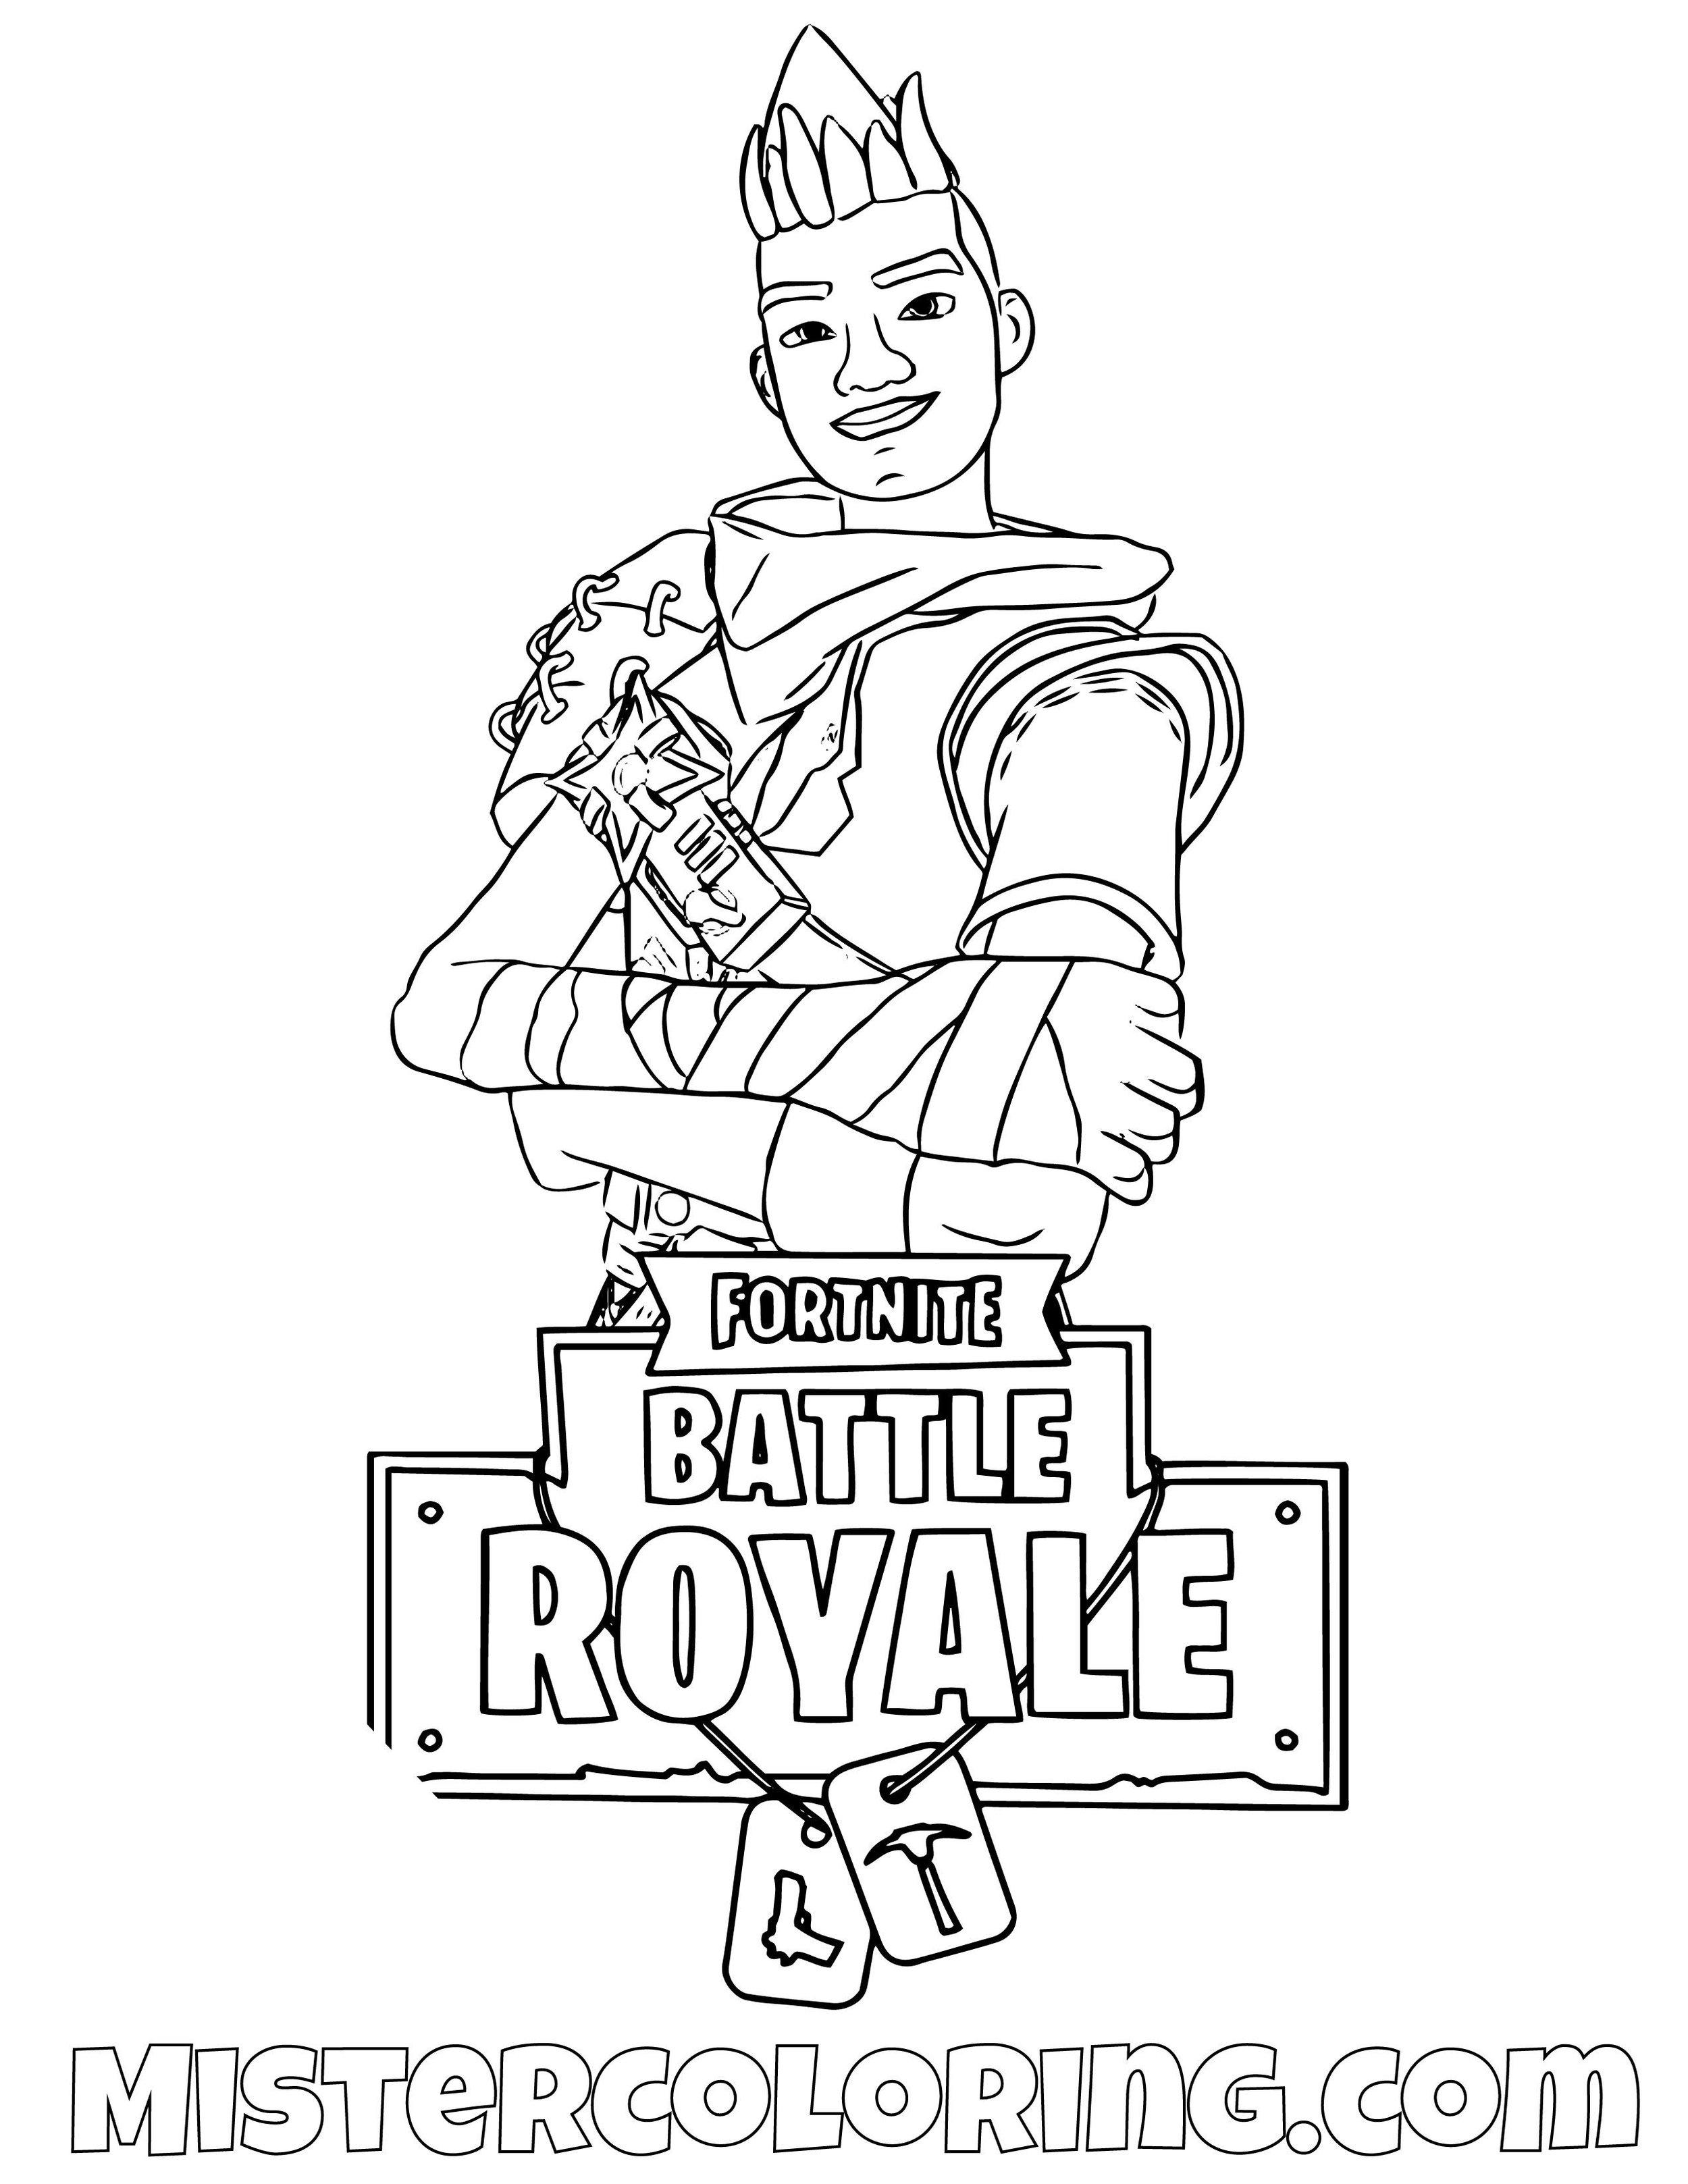 Ninja Fortnite Skin Coloring Page